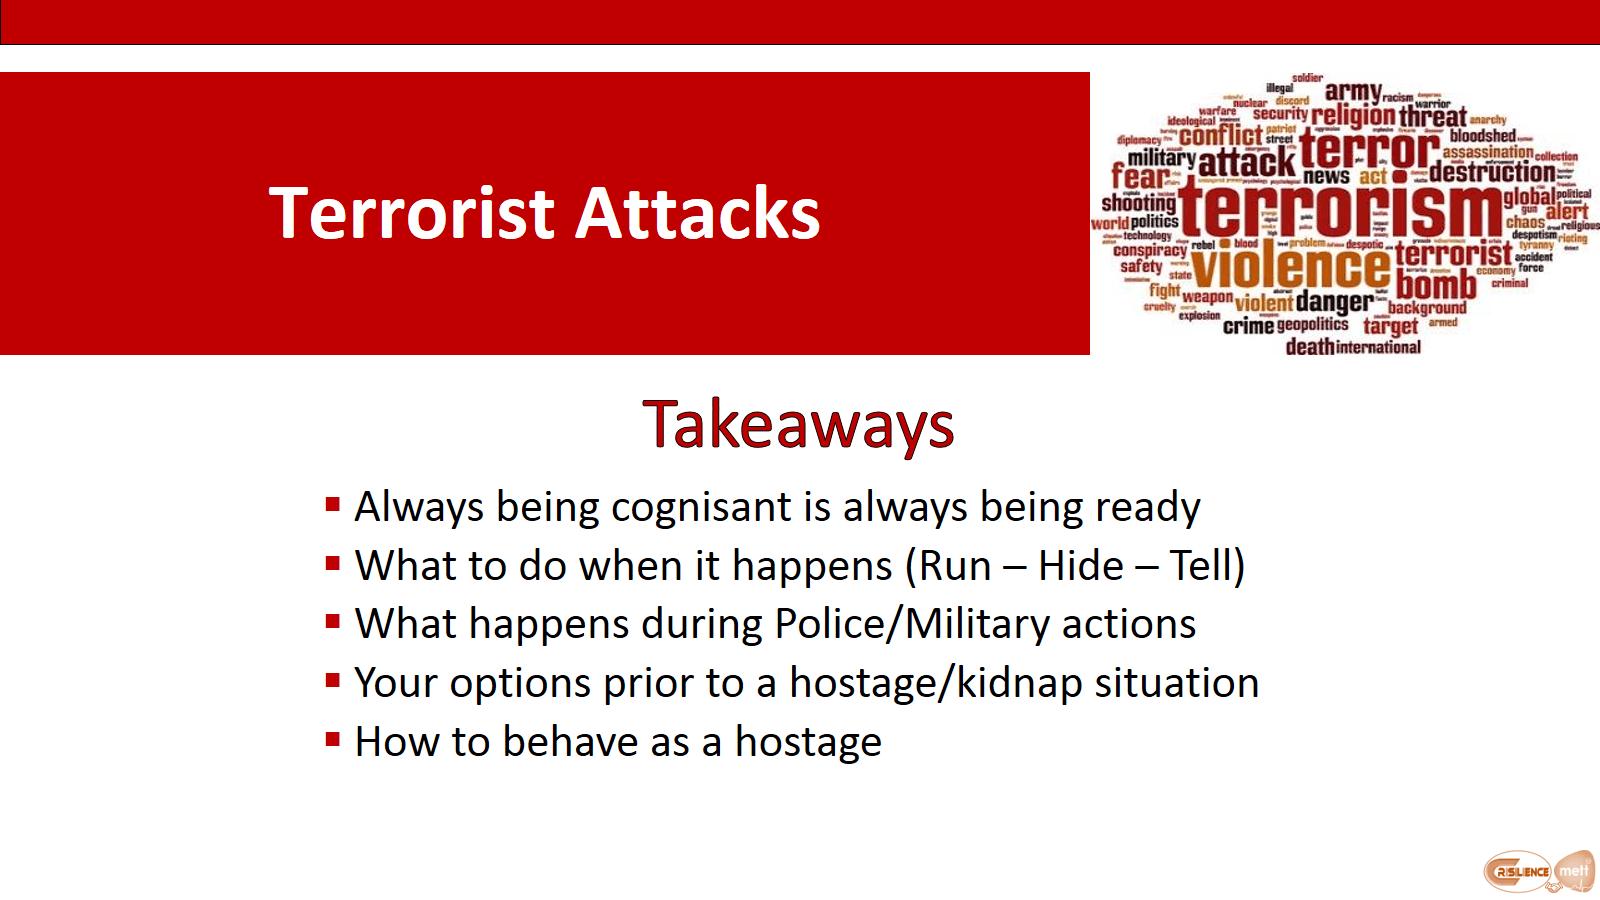 CIMAT slide 7 Terror Attack takeaways